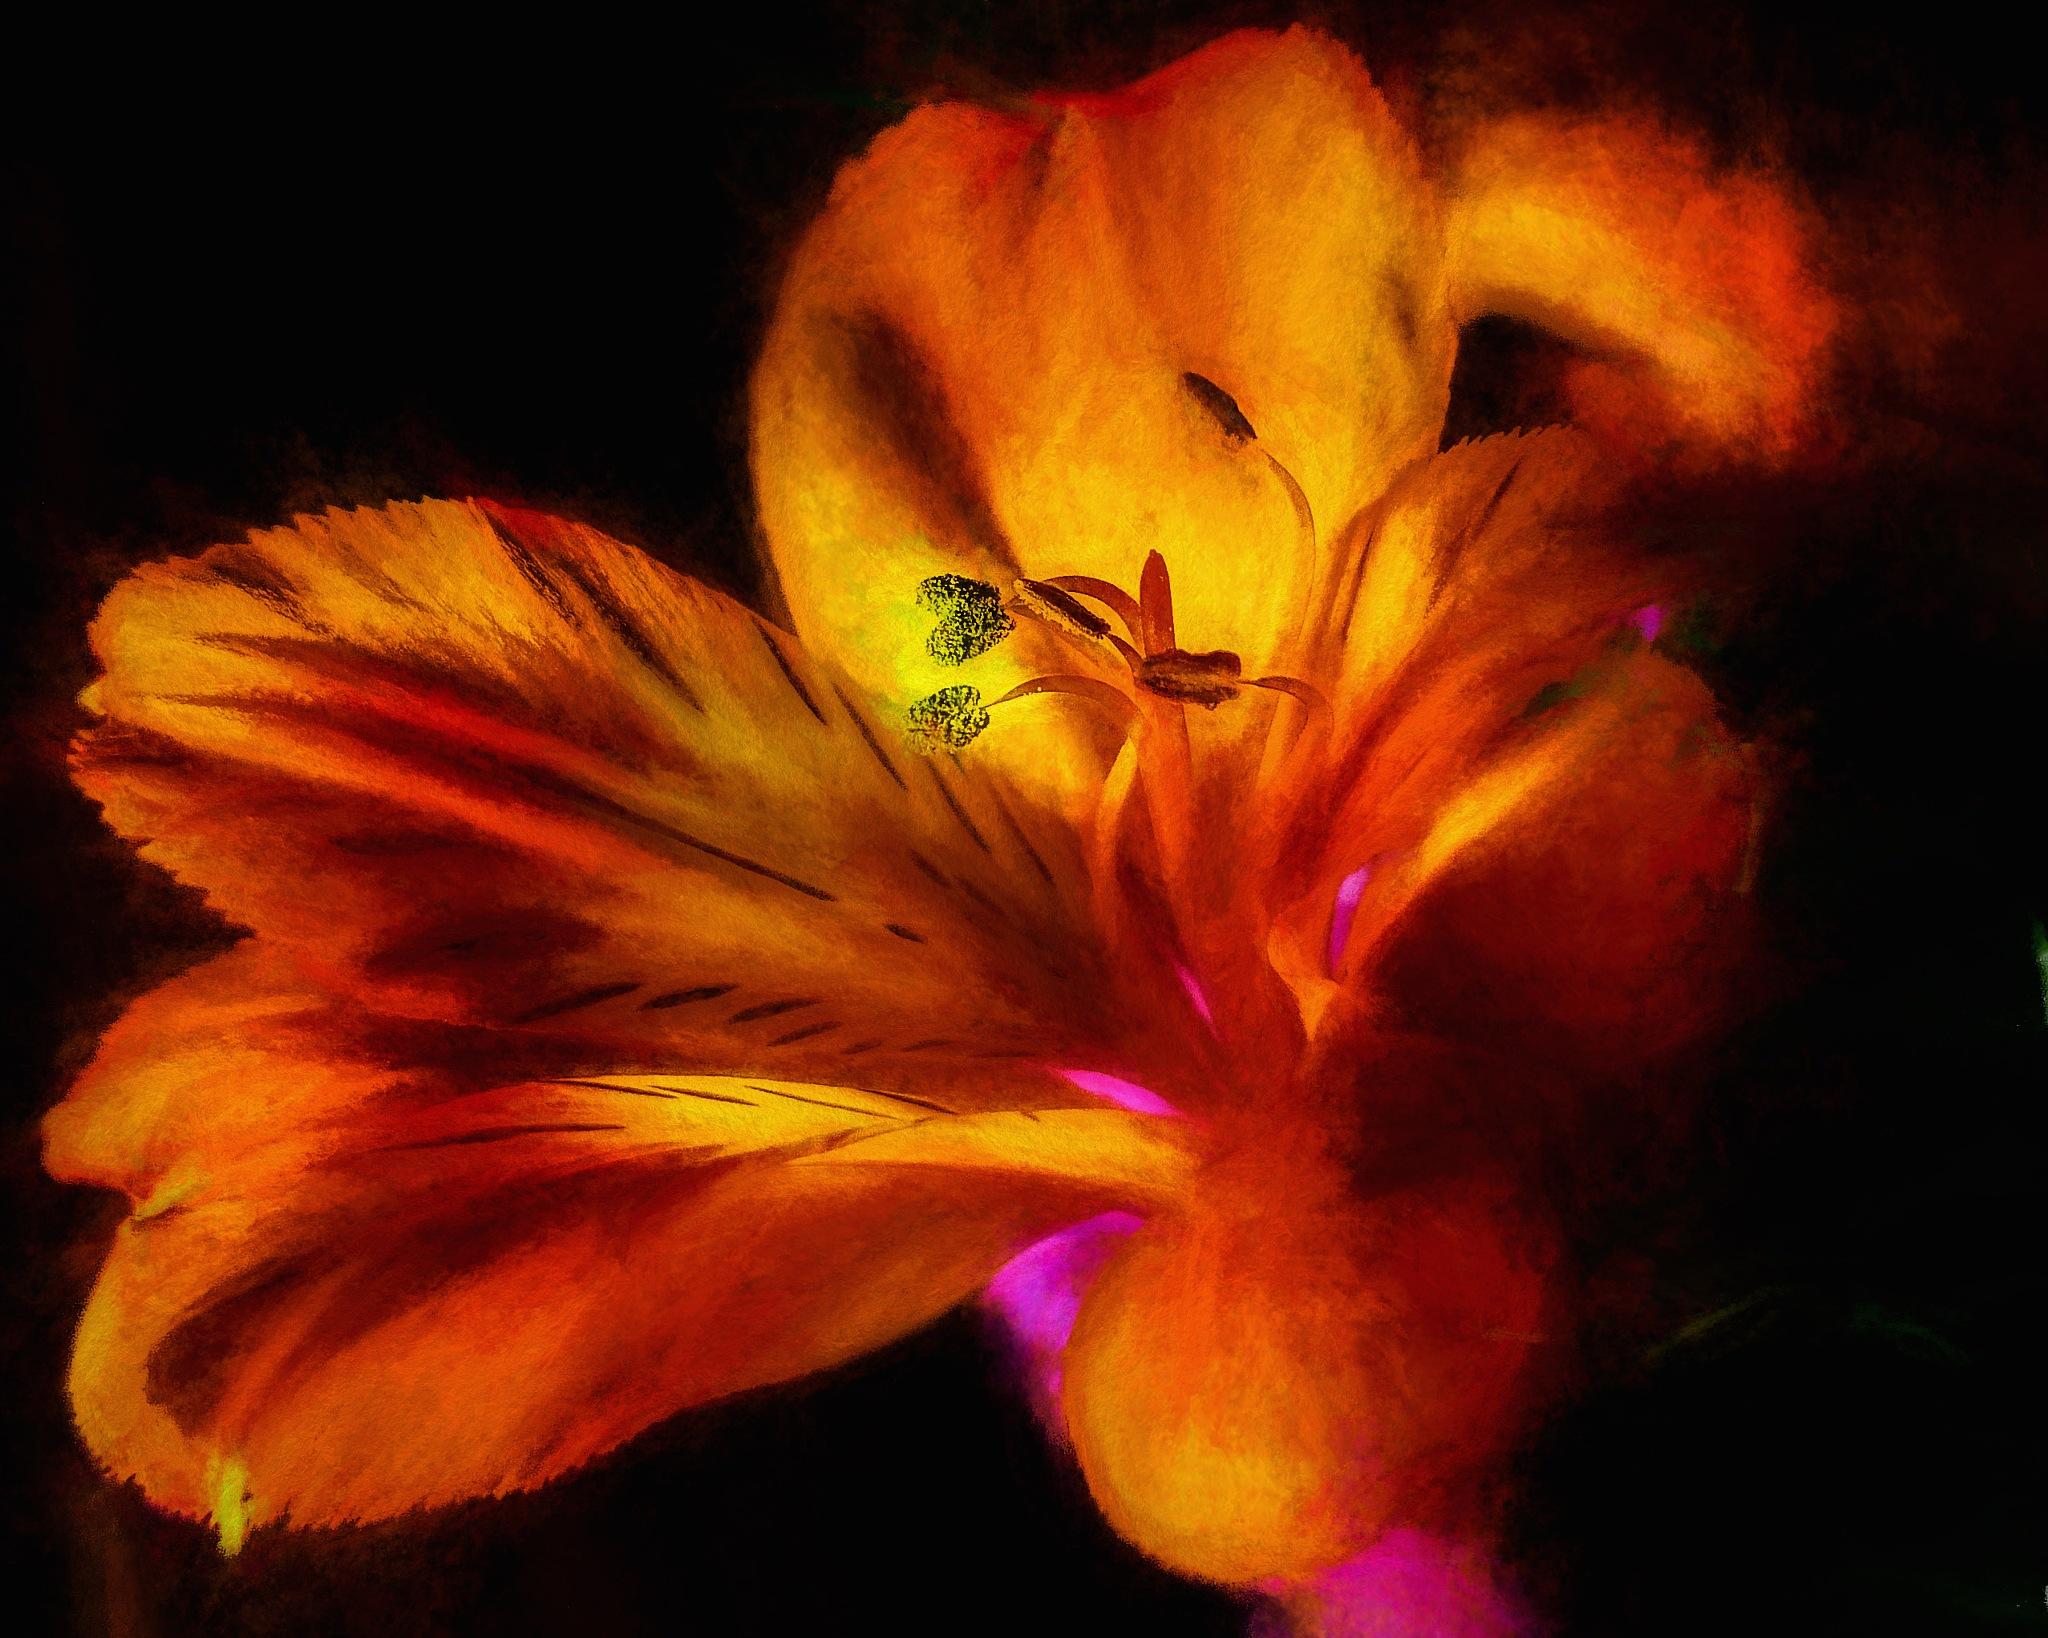 Digital Art Flower by David Walters